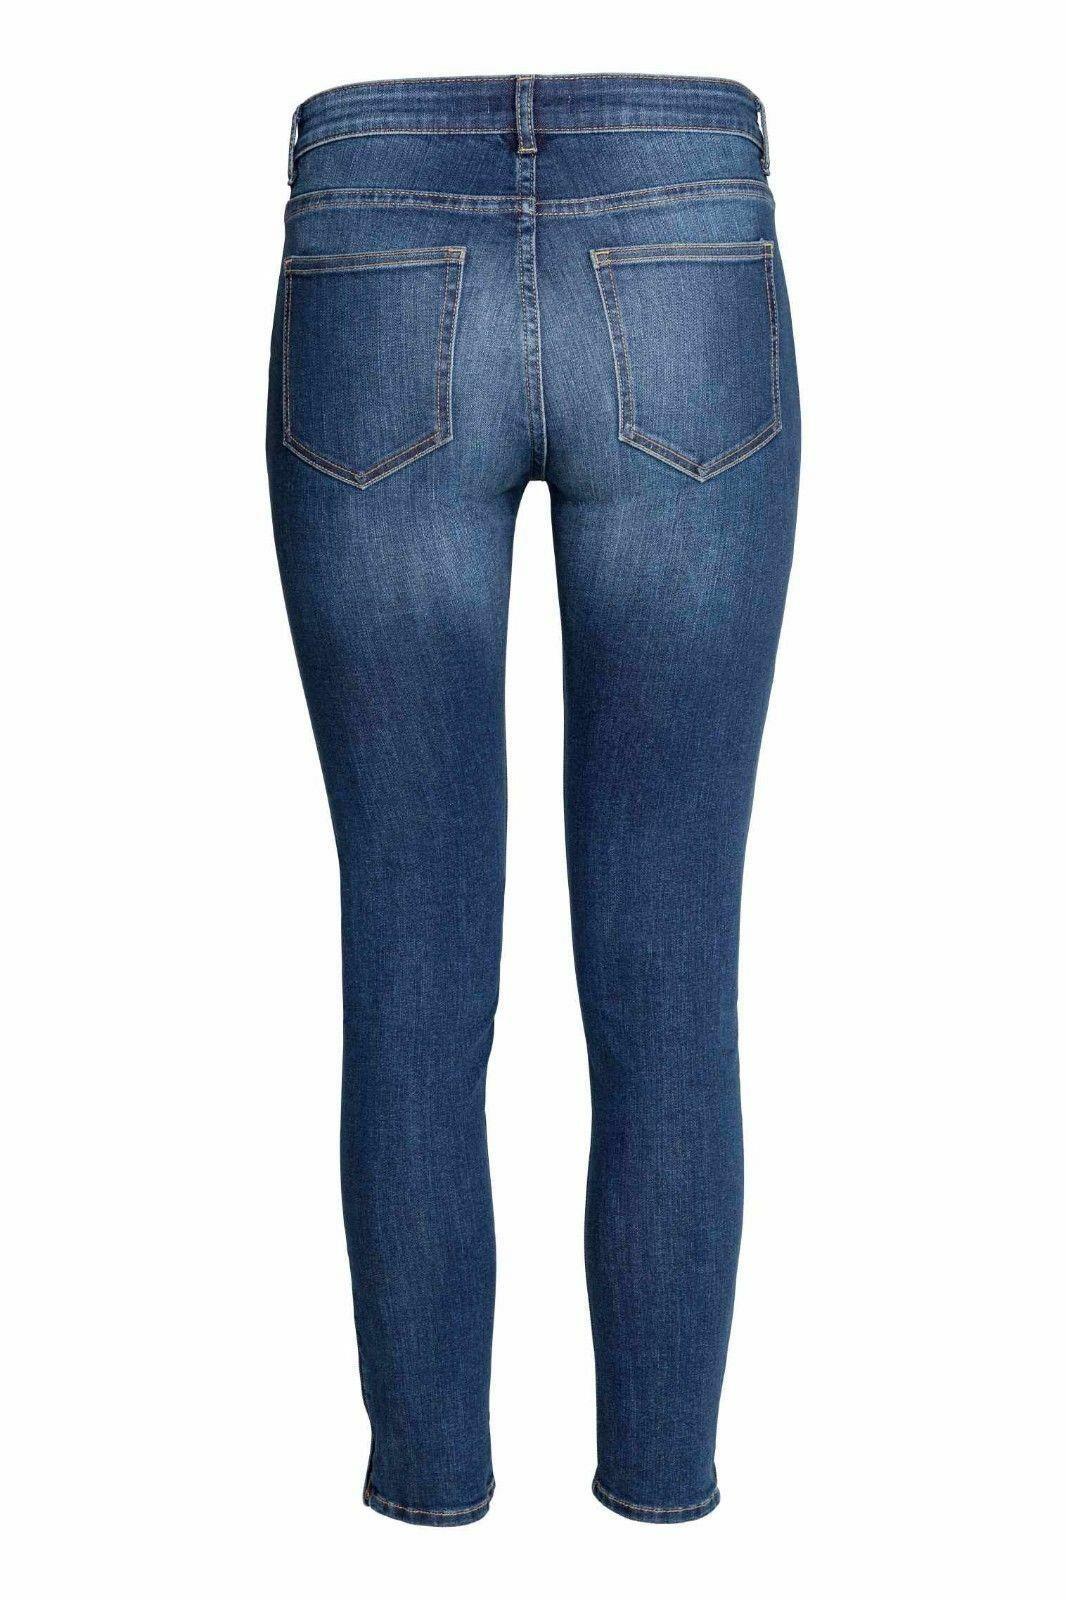 Ex-ZARA-femmes-womans-Jeans-Denim-Stretch-Pantalon-Pantalon-Taille-Tailles-UK-8-18 miniature 9